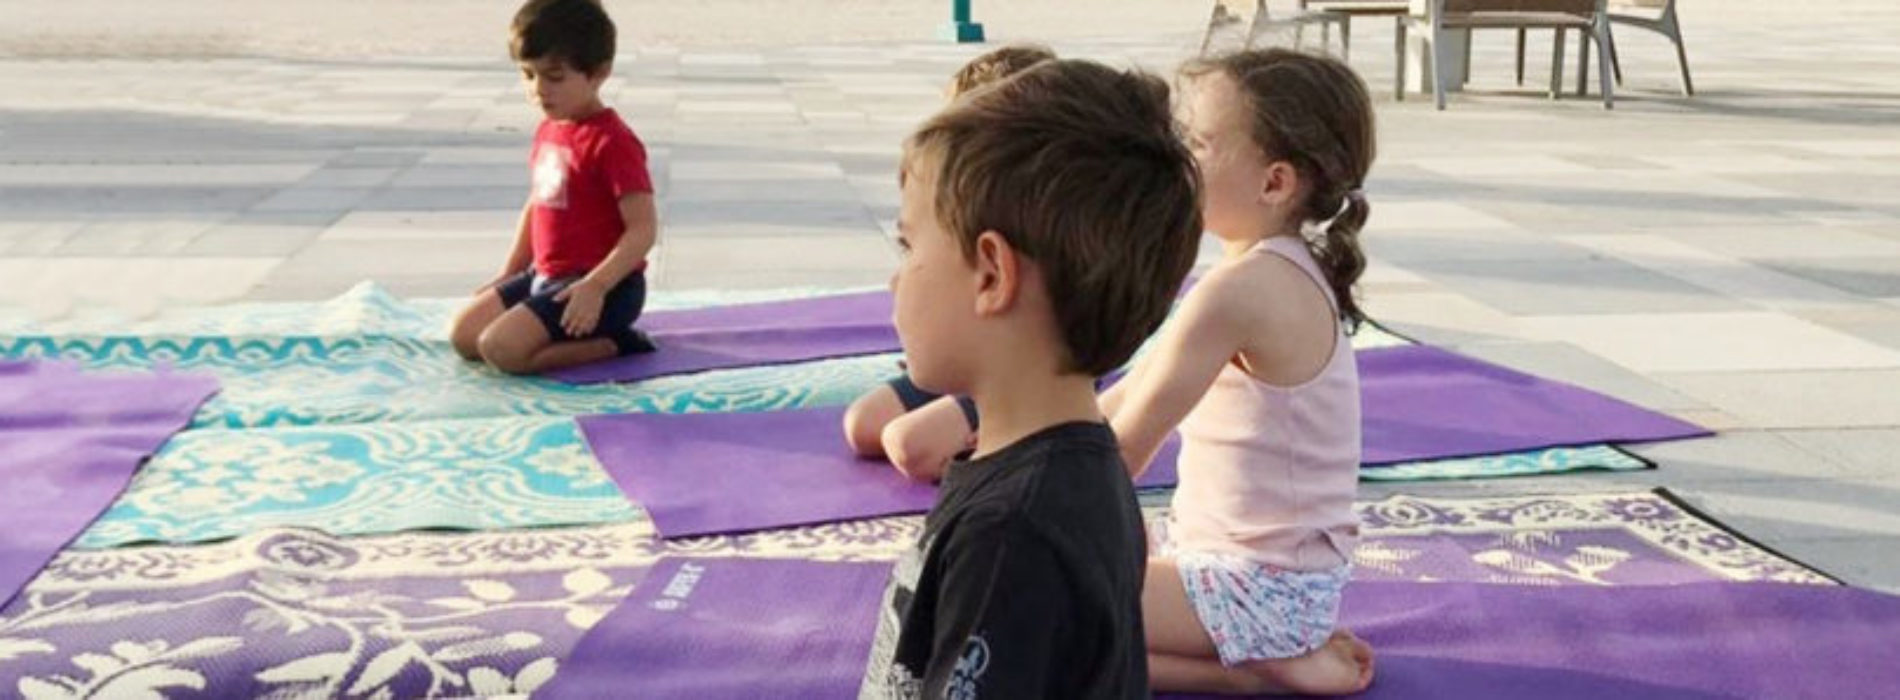 Dubai café to host after-school kids yoga class